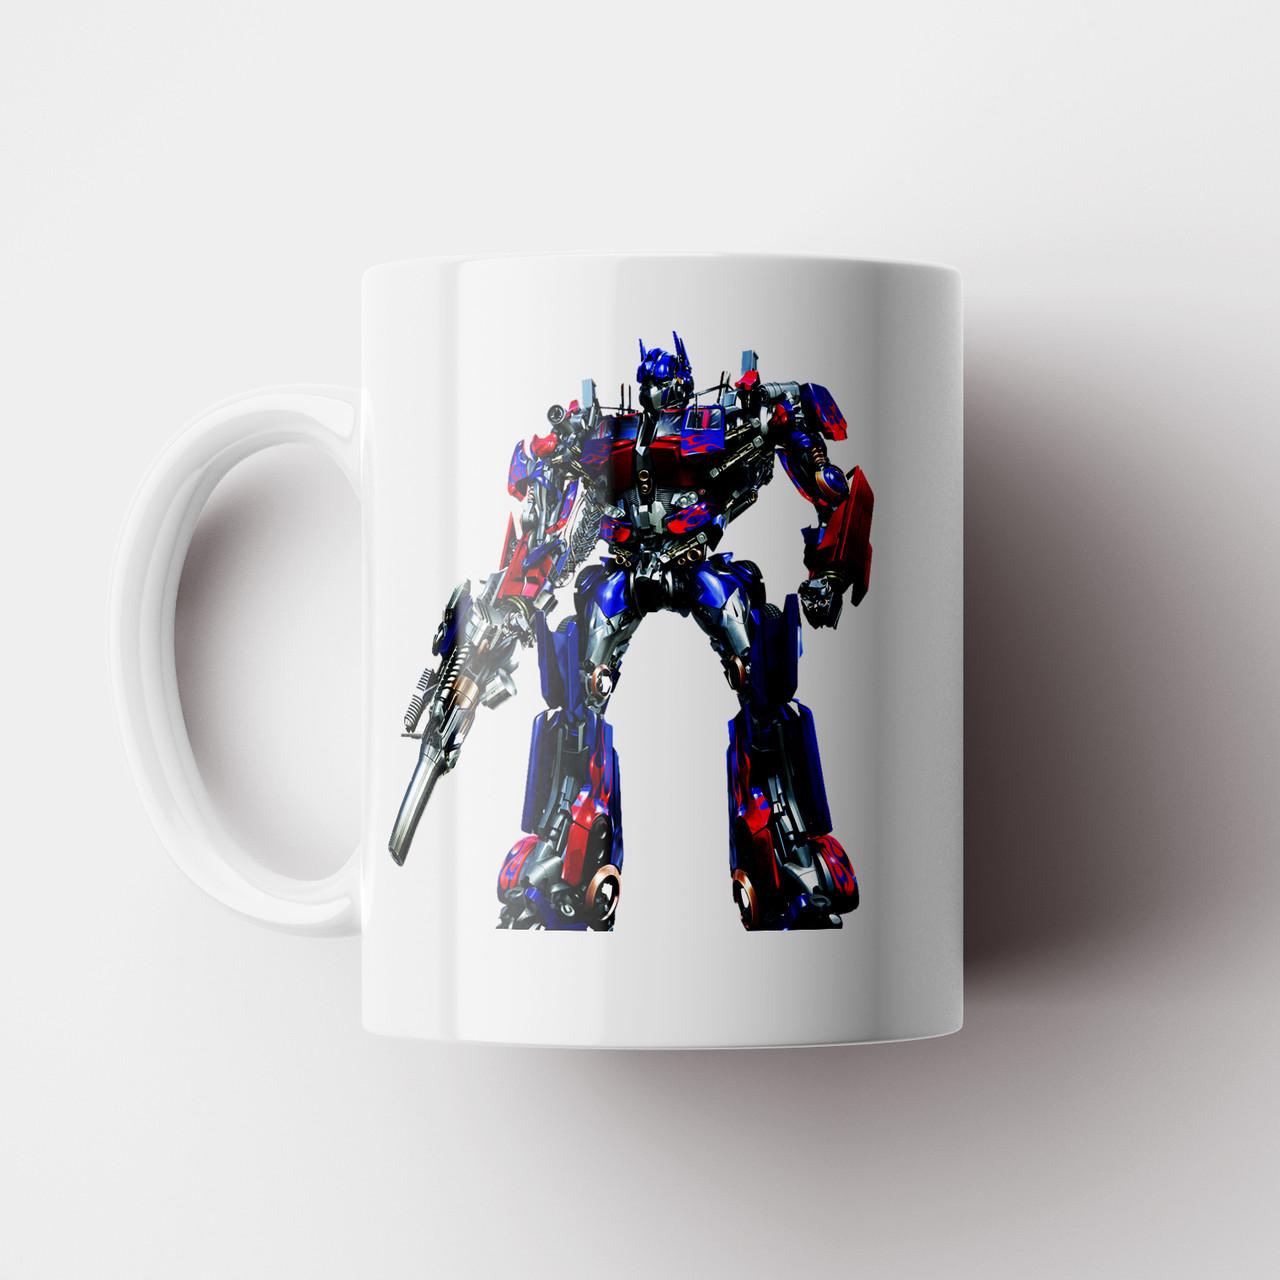 Чашка Трансформери Оптімус Прайм. Transformers